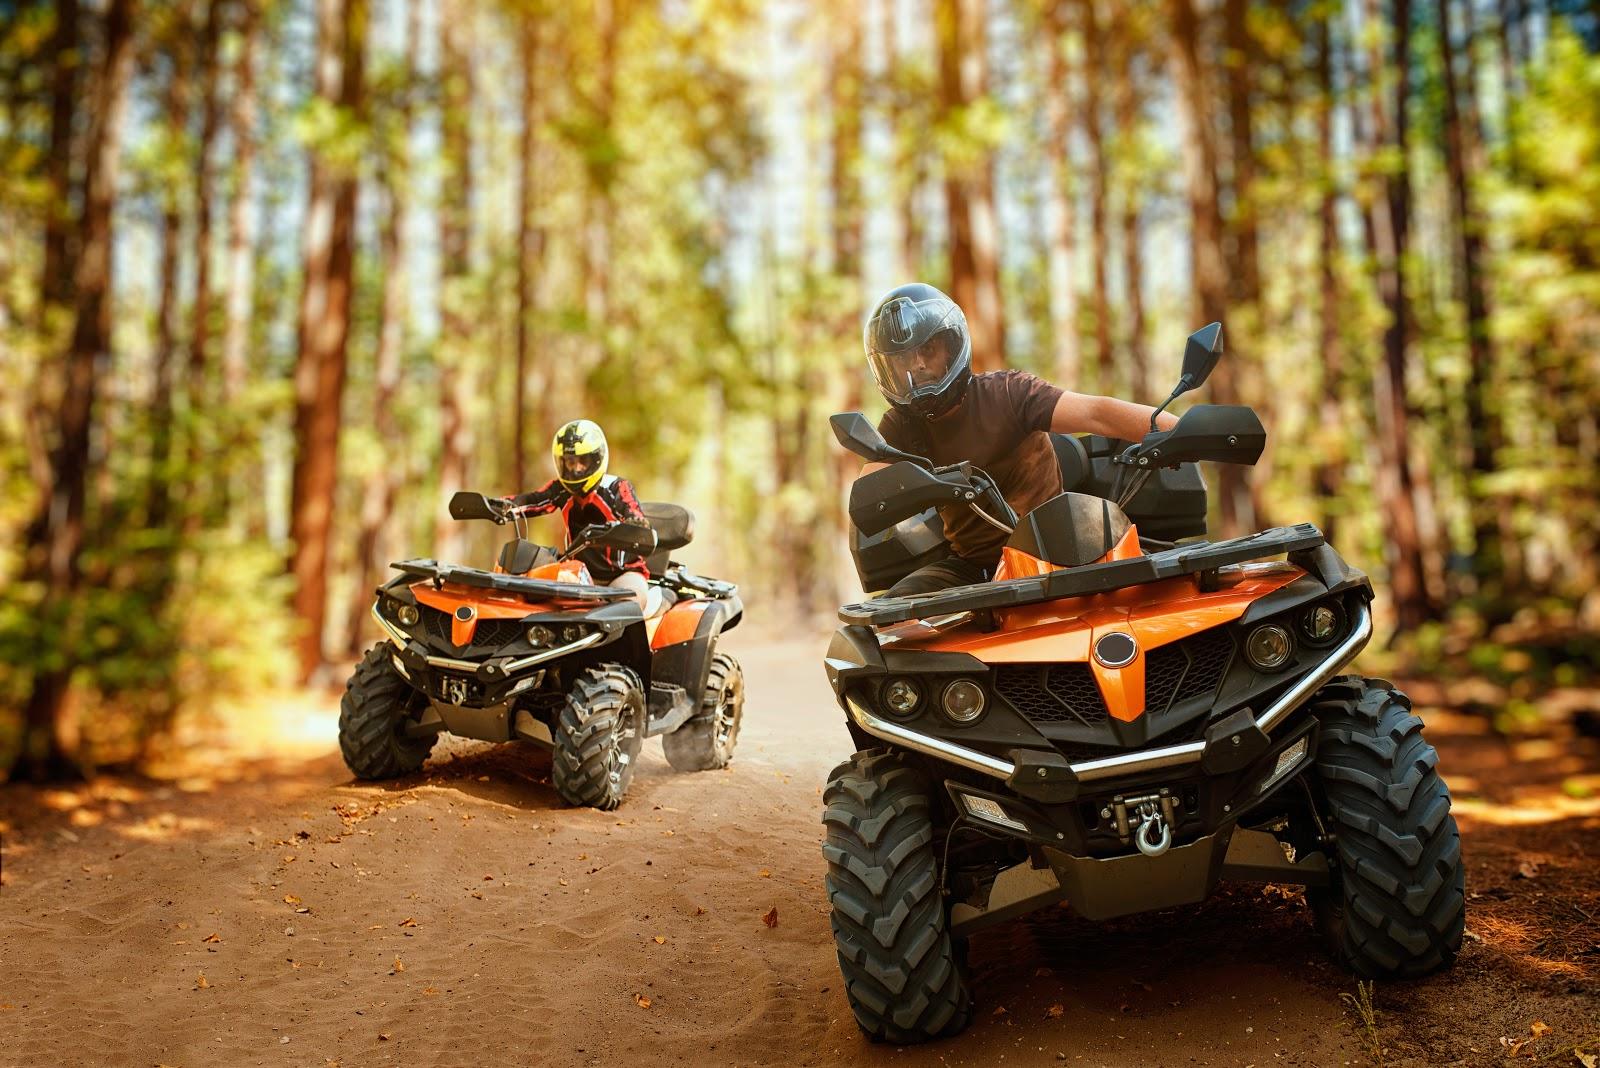 ATV Riders in Woods.jpeg